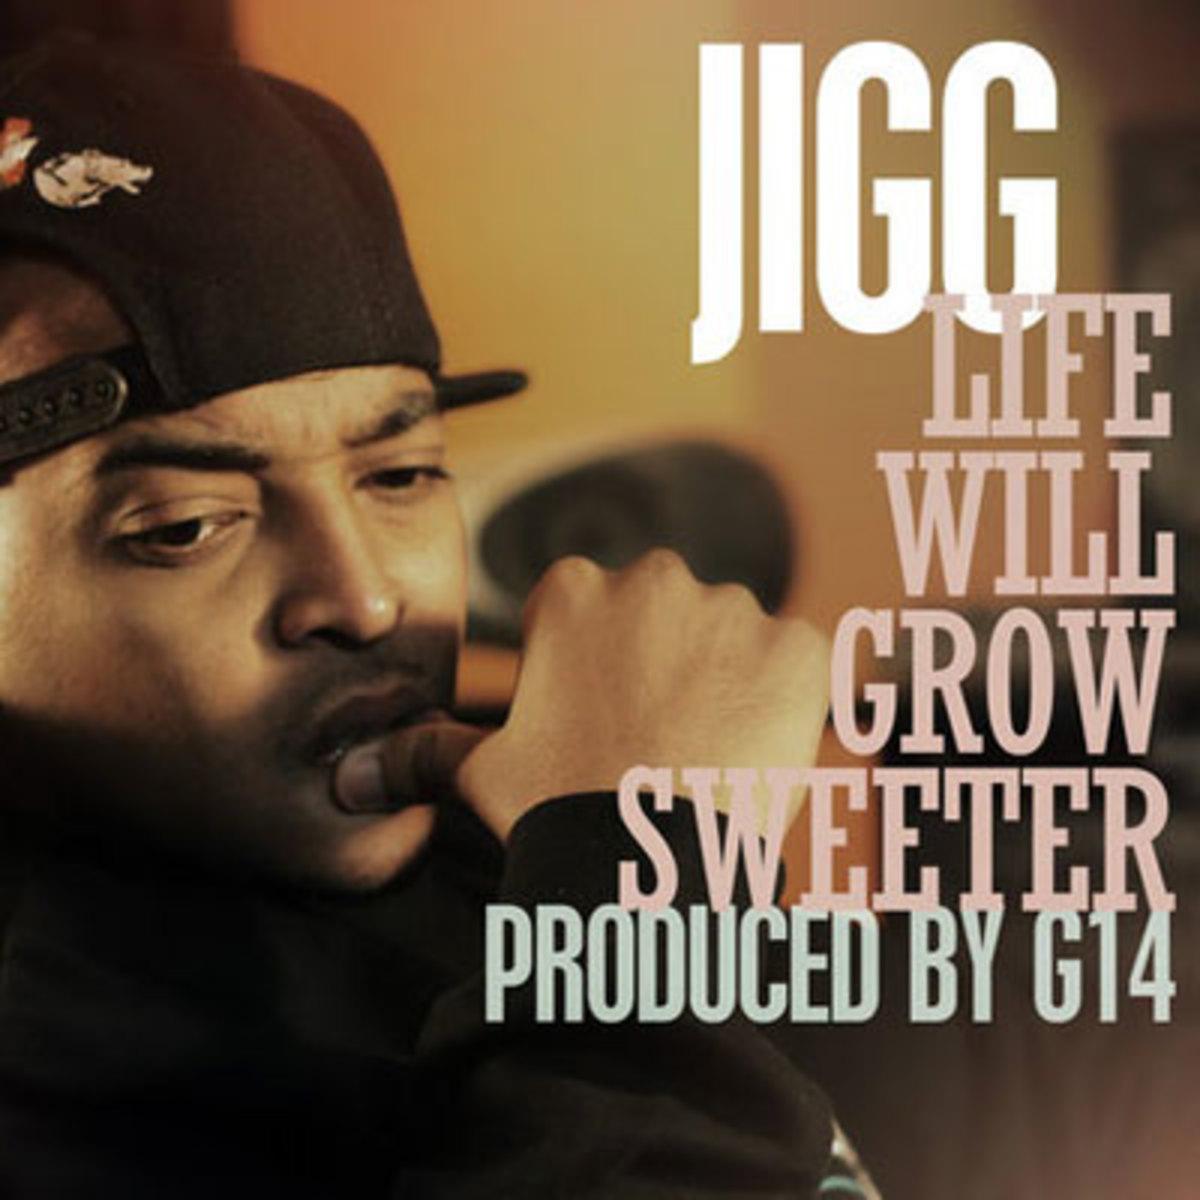 jigg-lifewillgrow.jpg